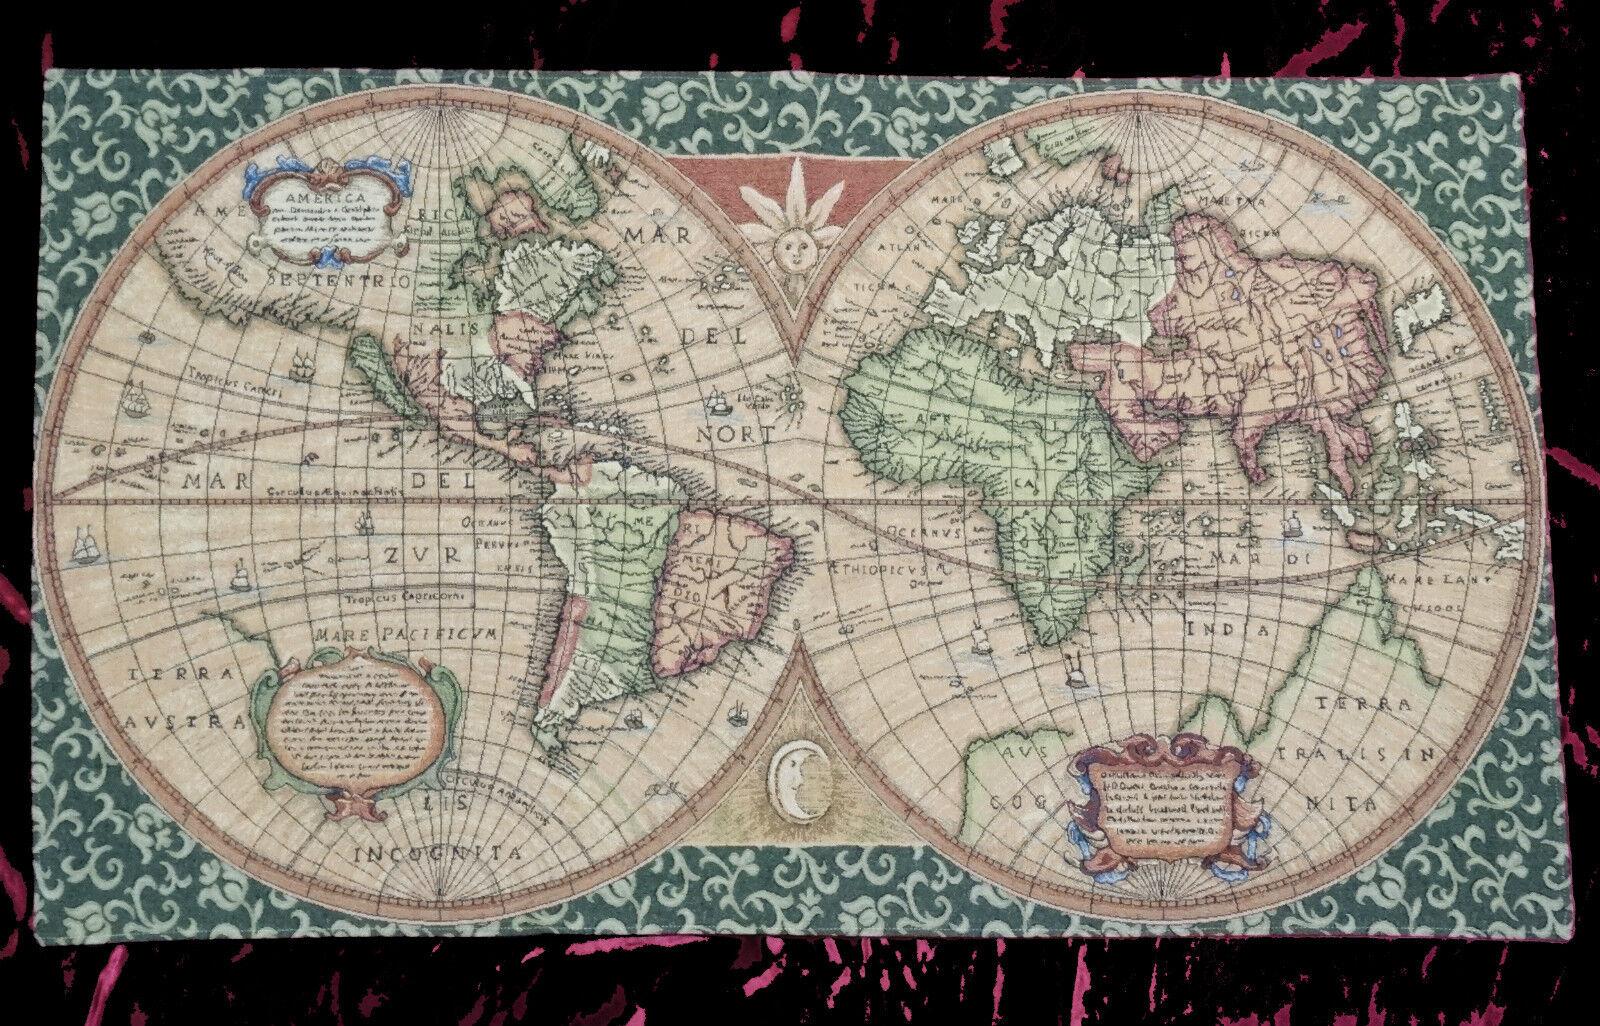 Wandteppich gobelin italy old map weltkarte antik design - Arbeitszimmer grun ...